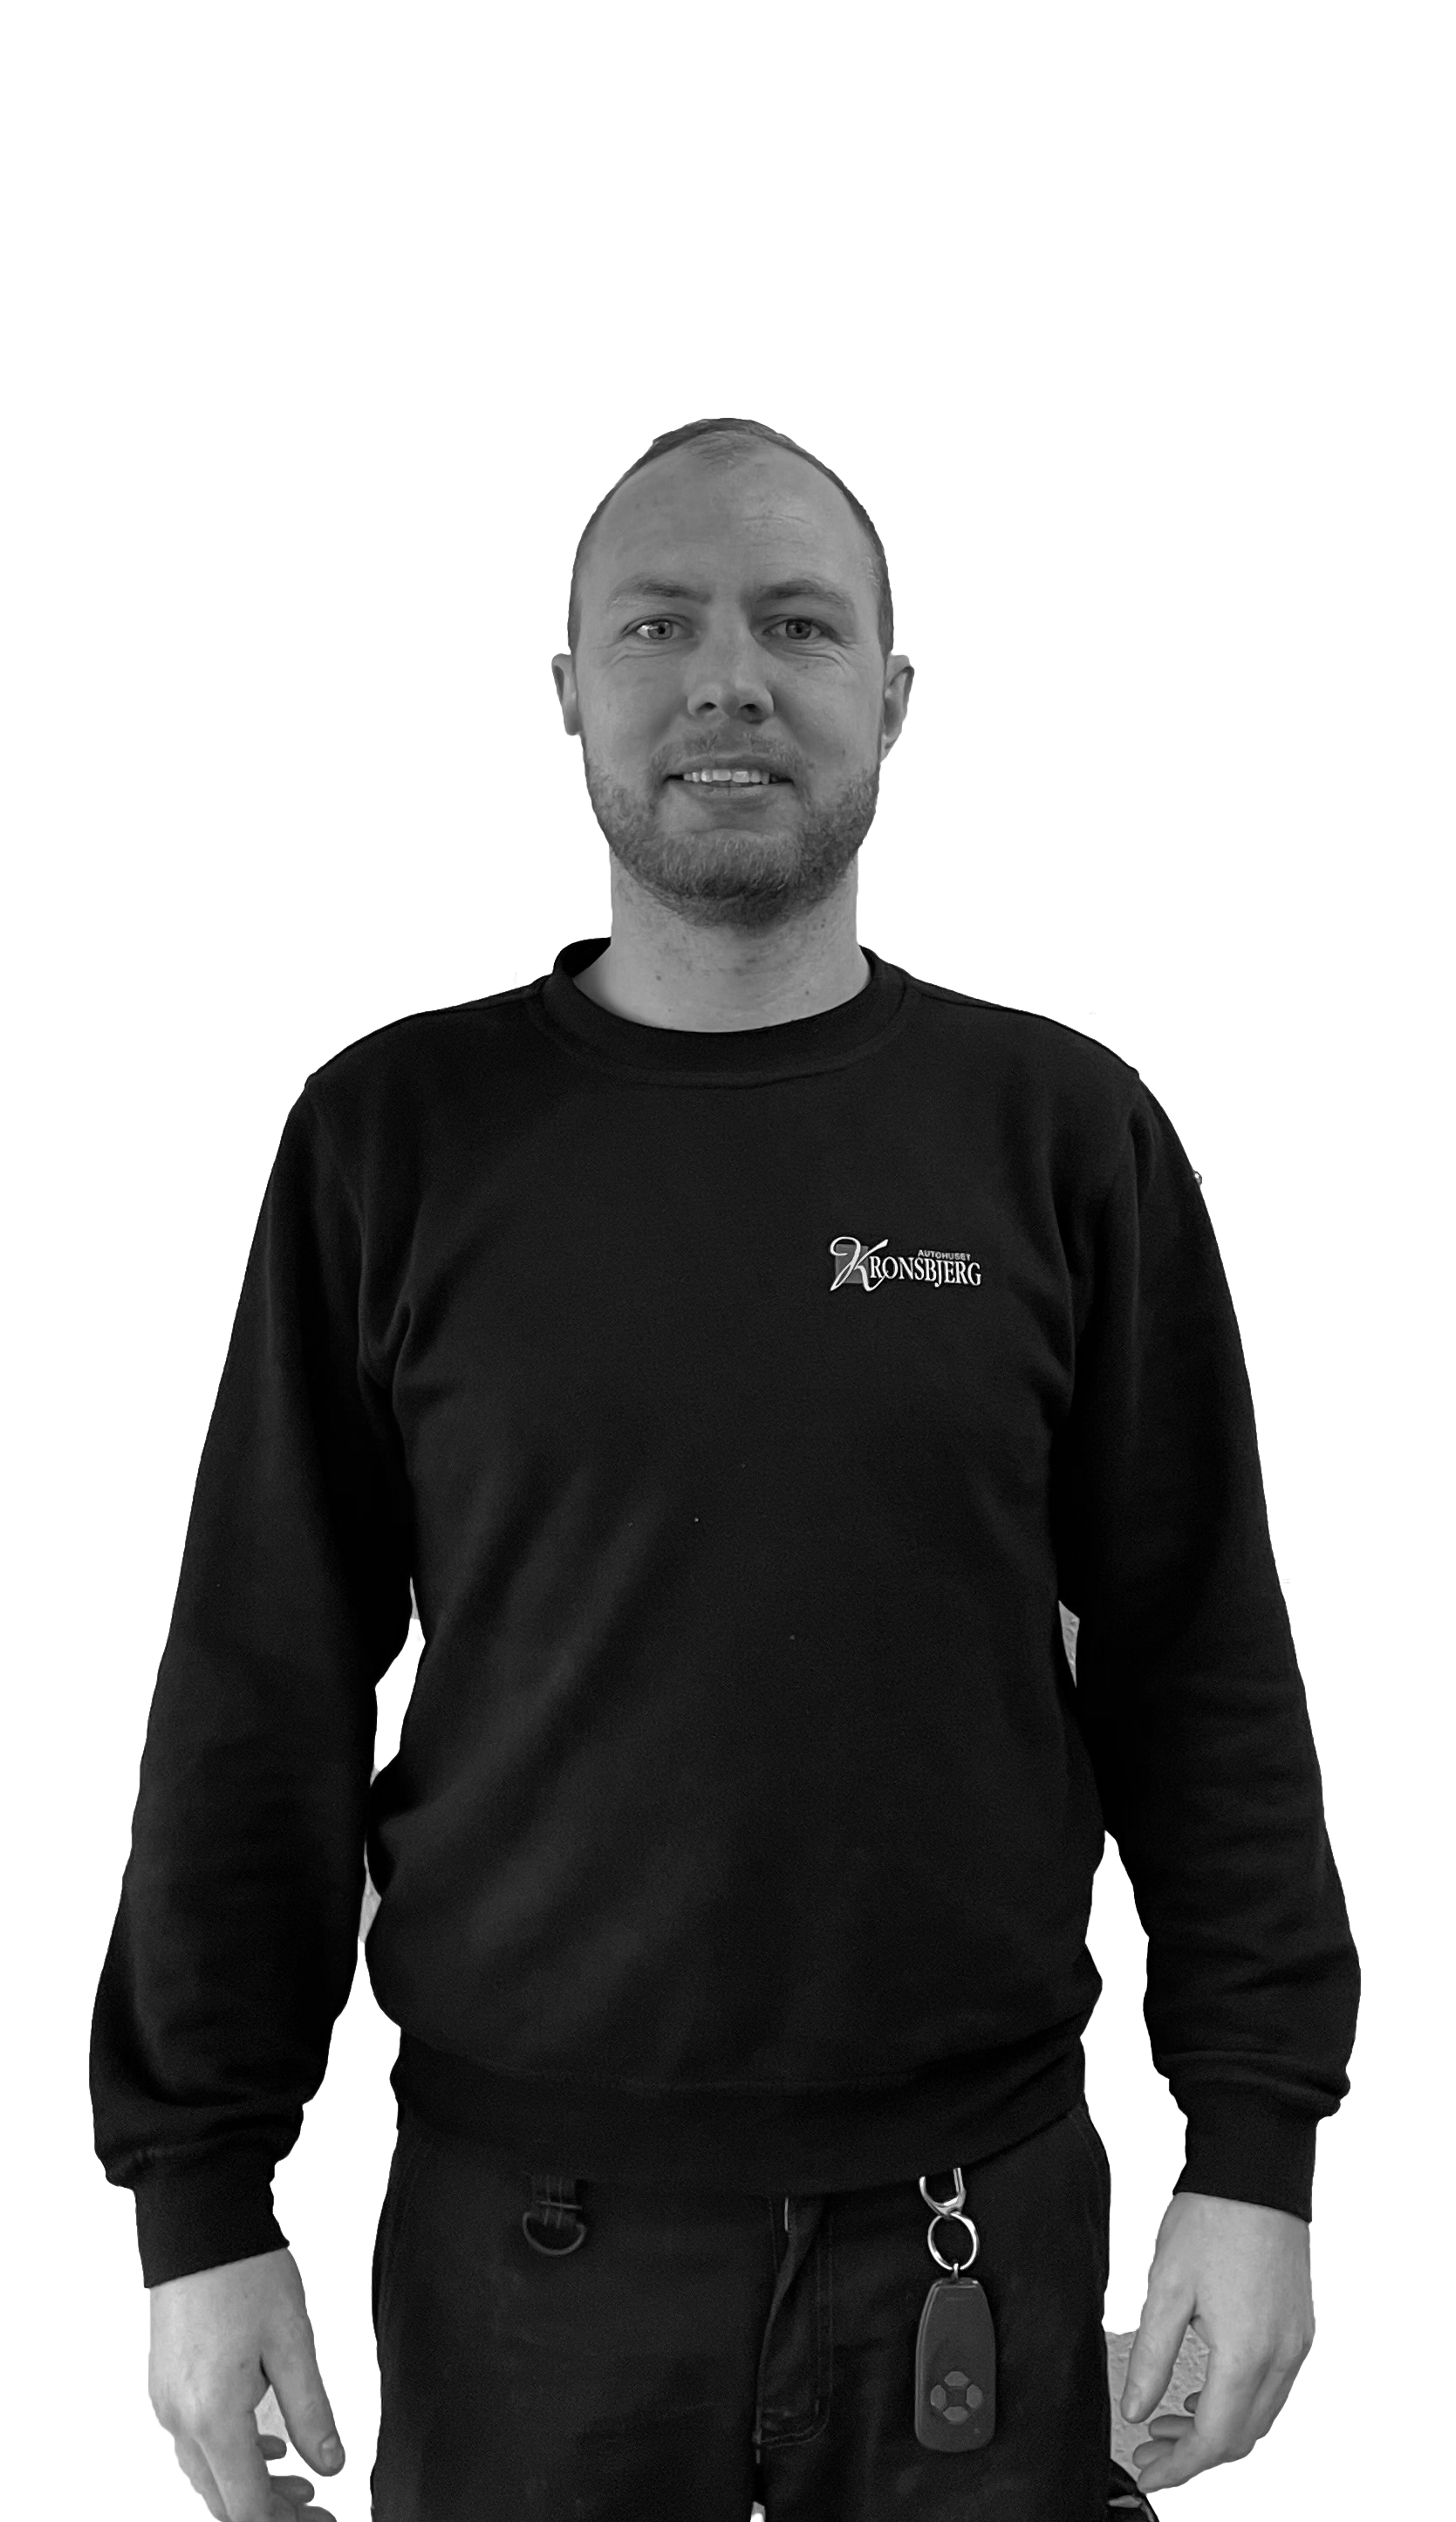 Morten Østbjerg